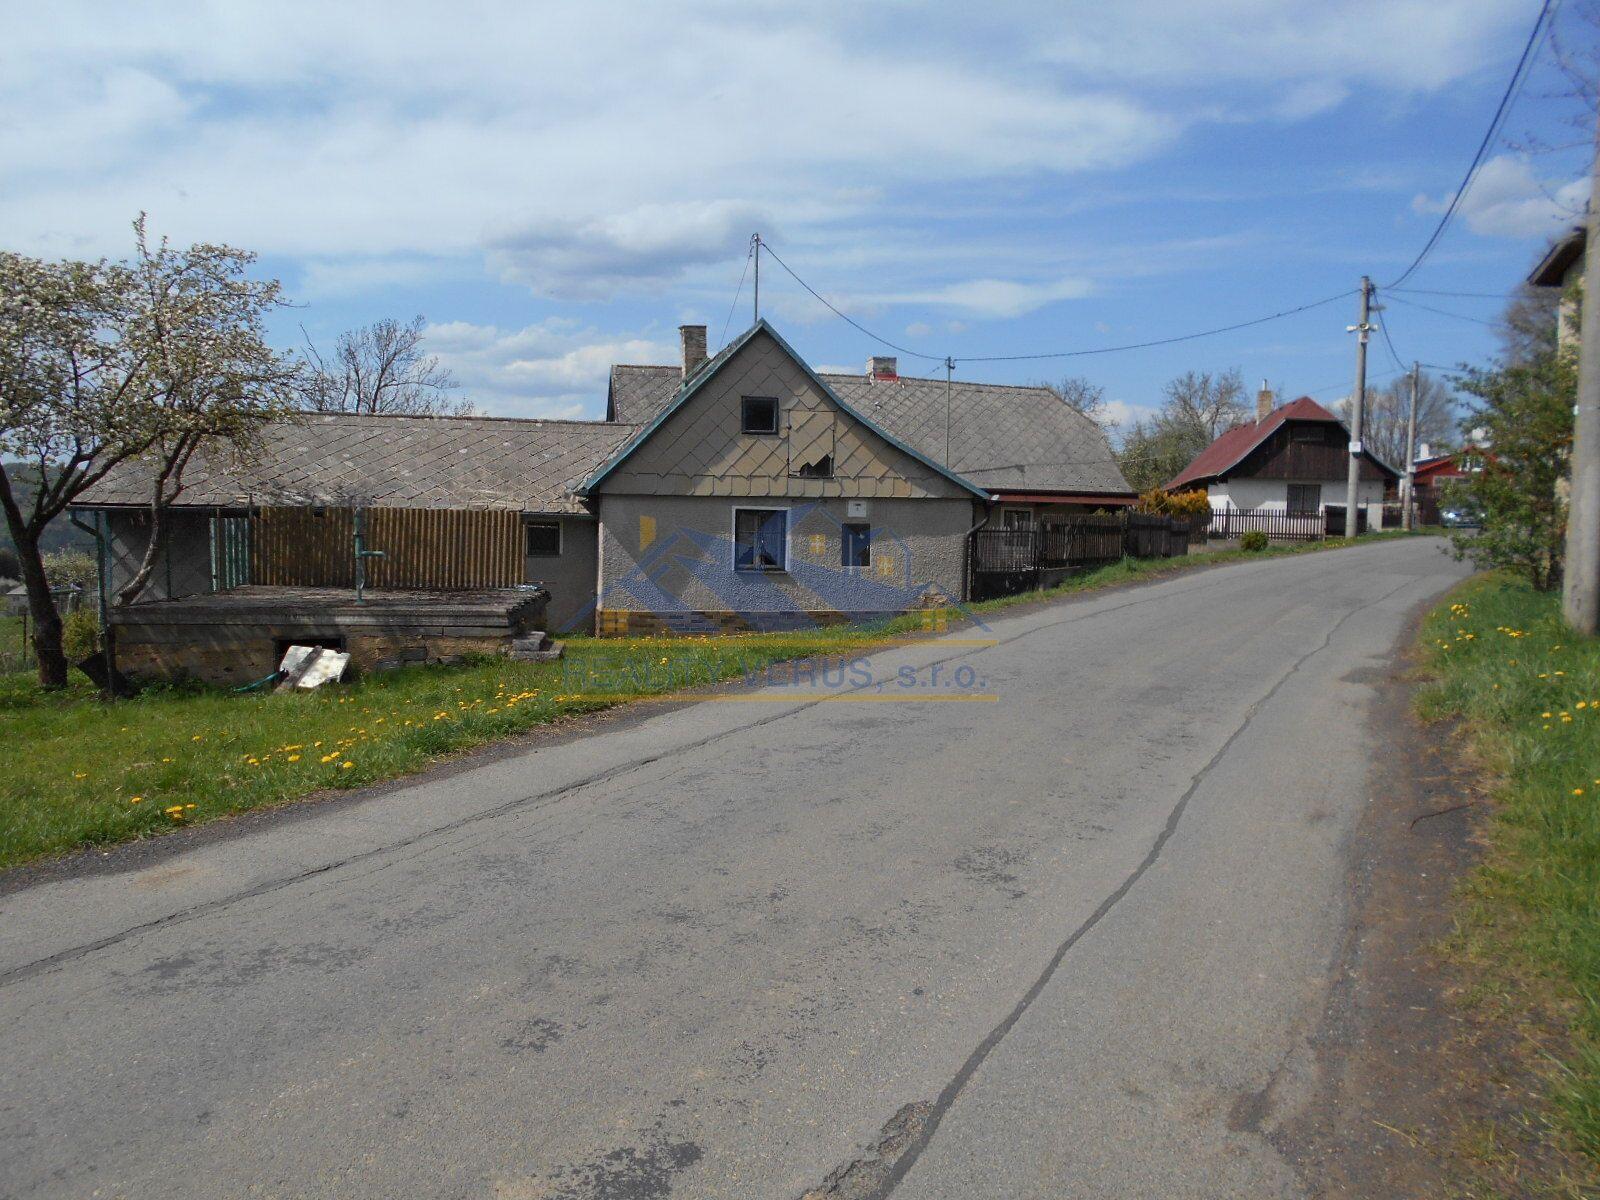 Prodej chalupy  70 m, pozemek 436 m Zaječov - Kvaň, okres Beroun